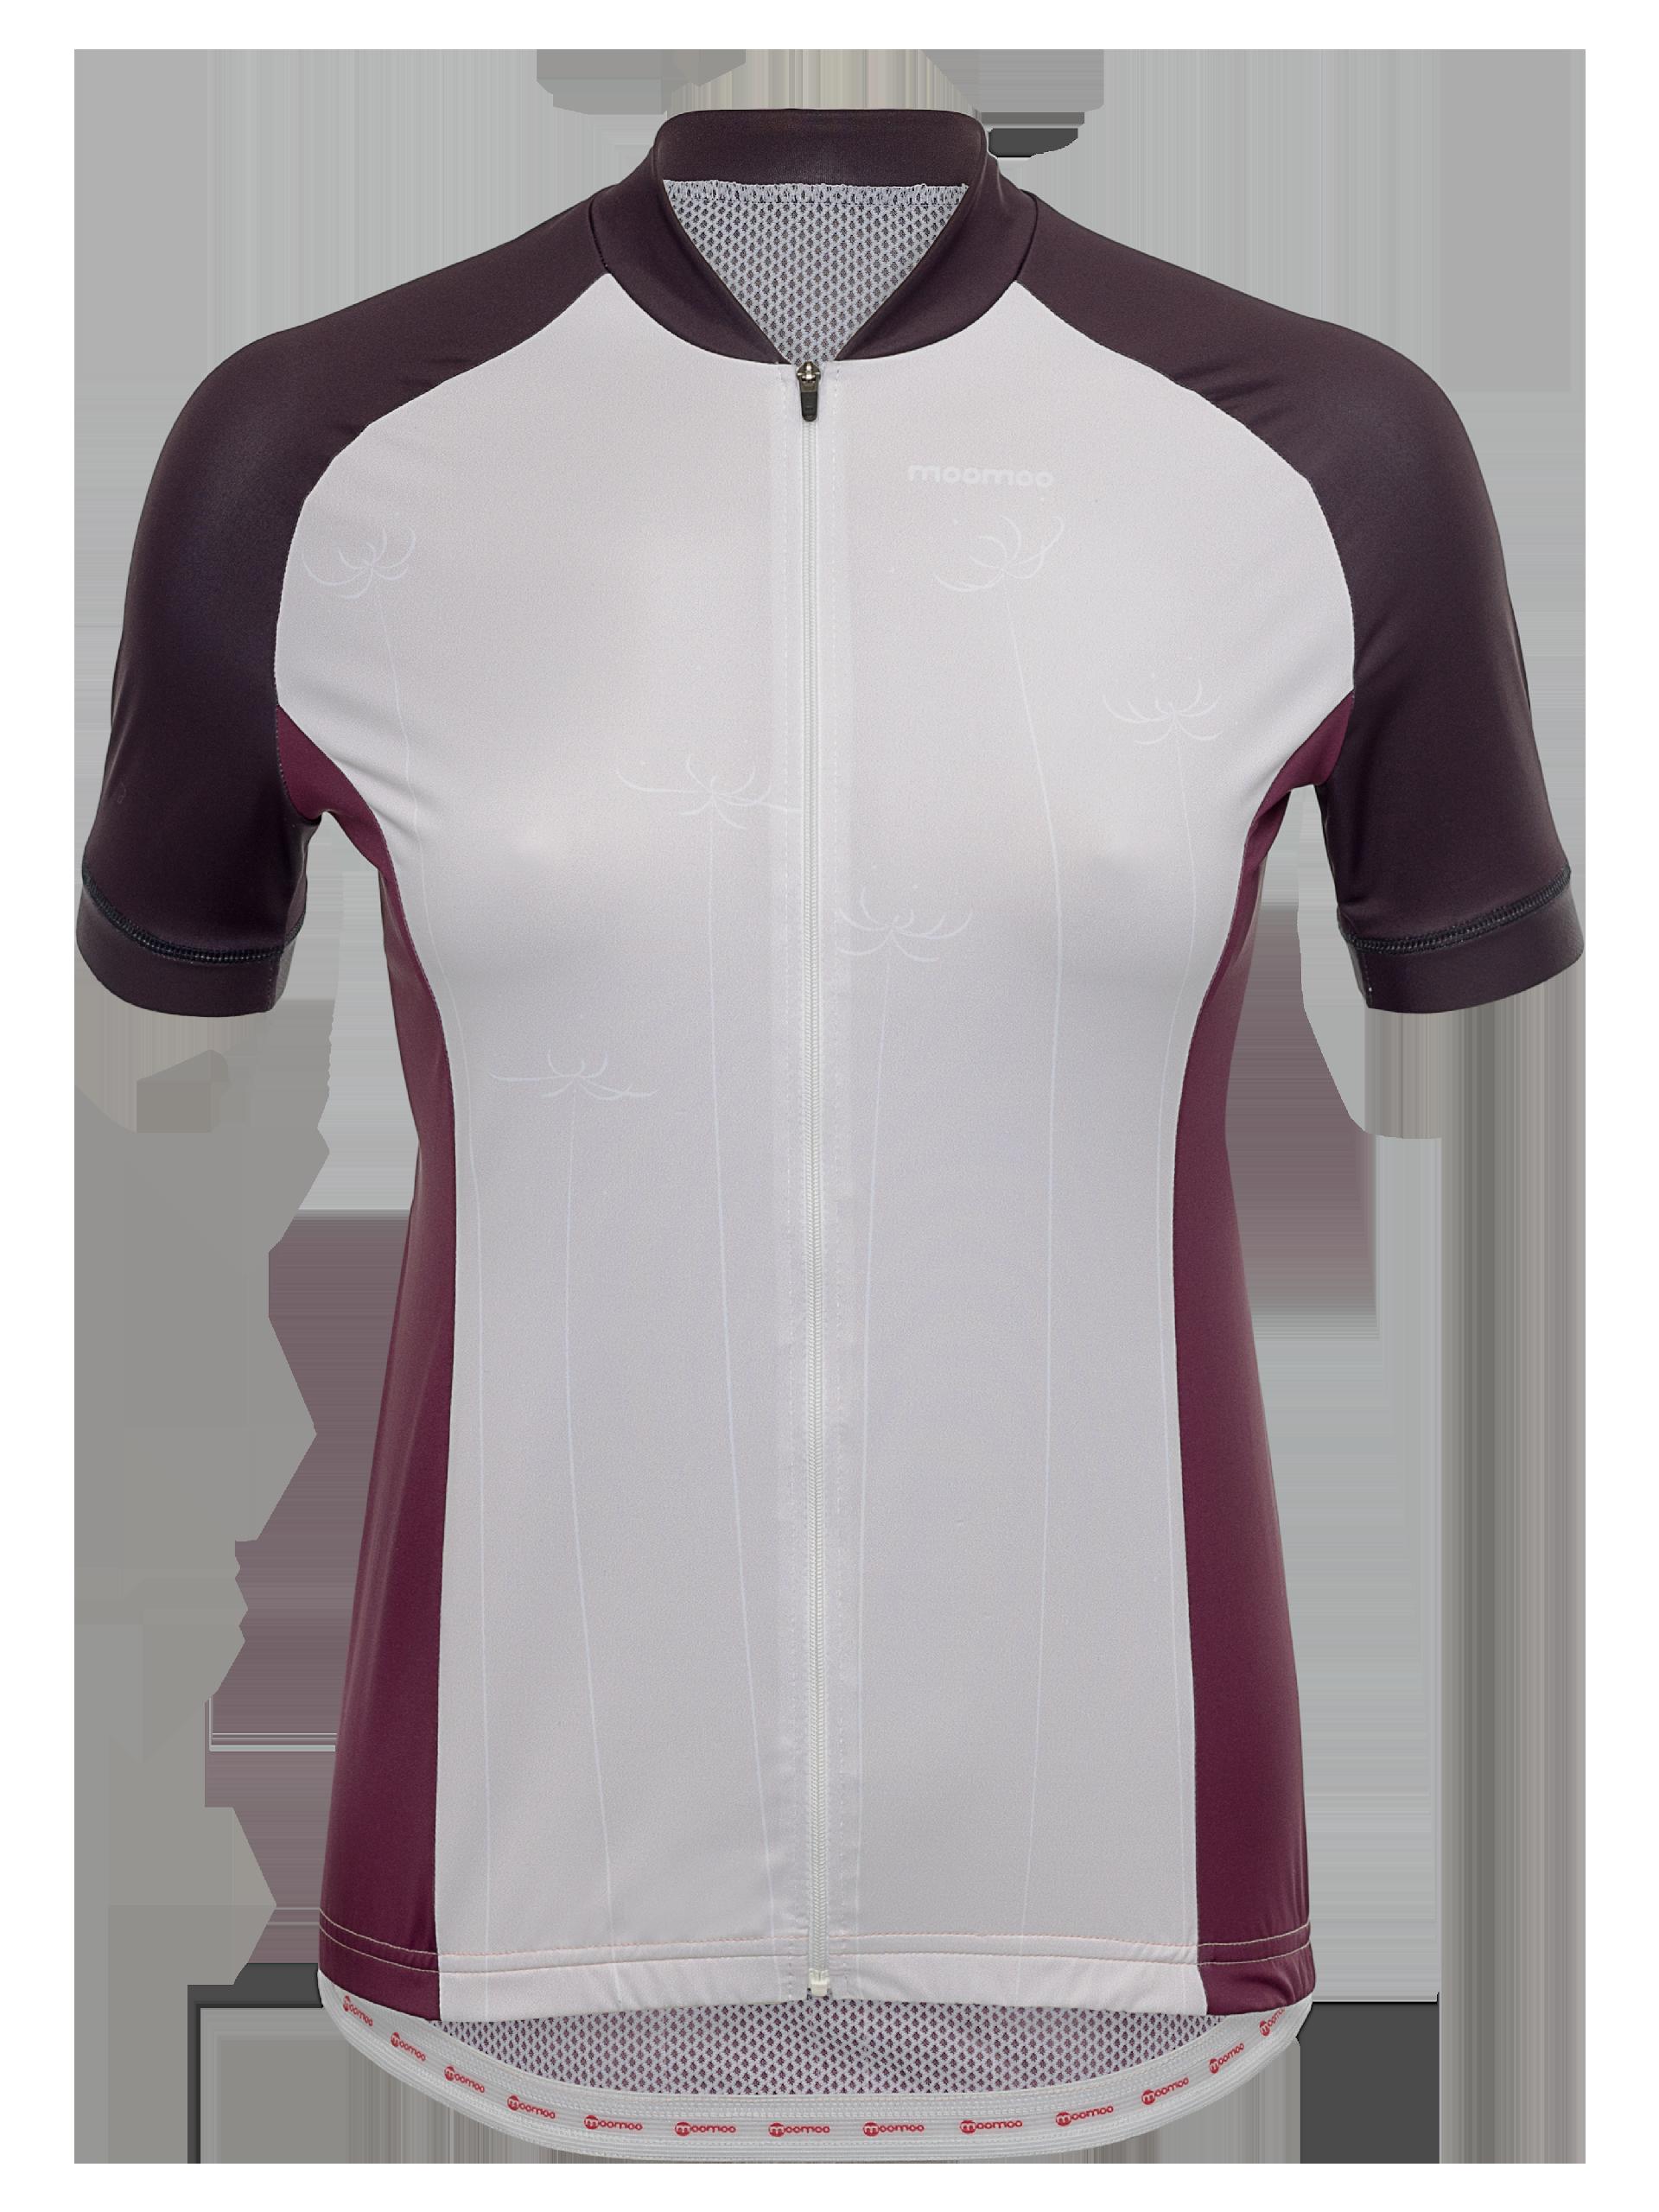 5b2fbdb552e Flash cycling apparel collection | Women's Jersey | Petal Burgundy ...